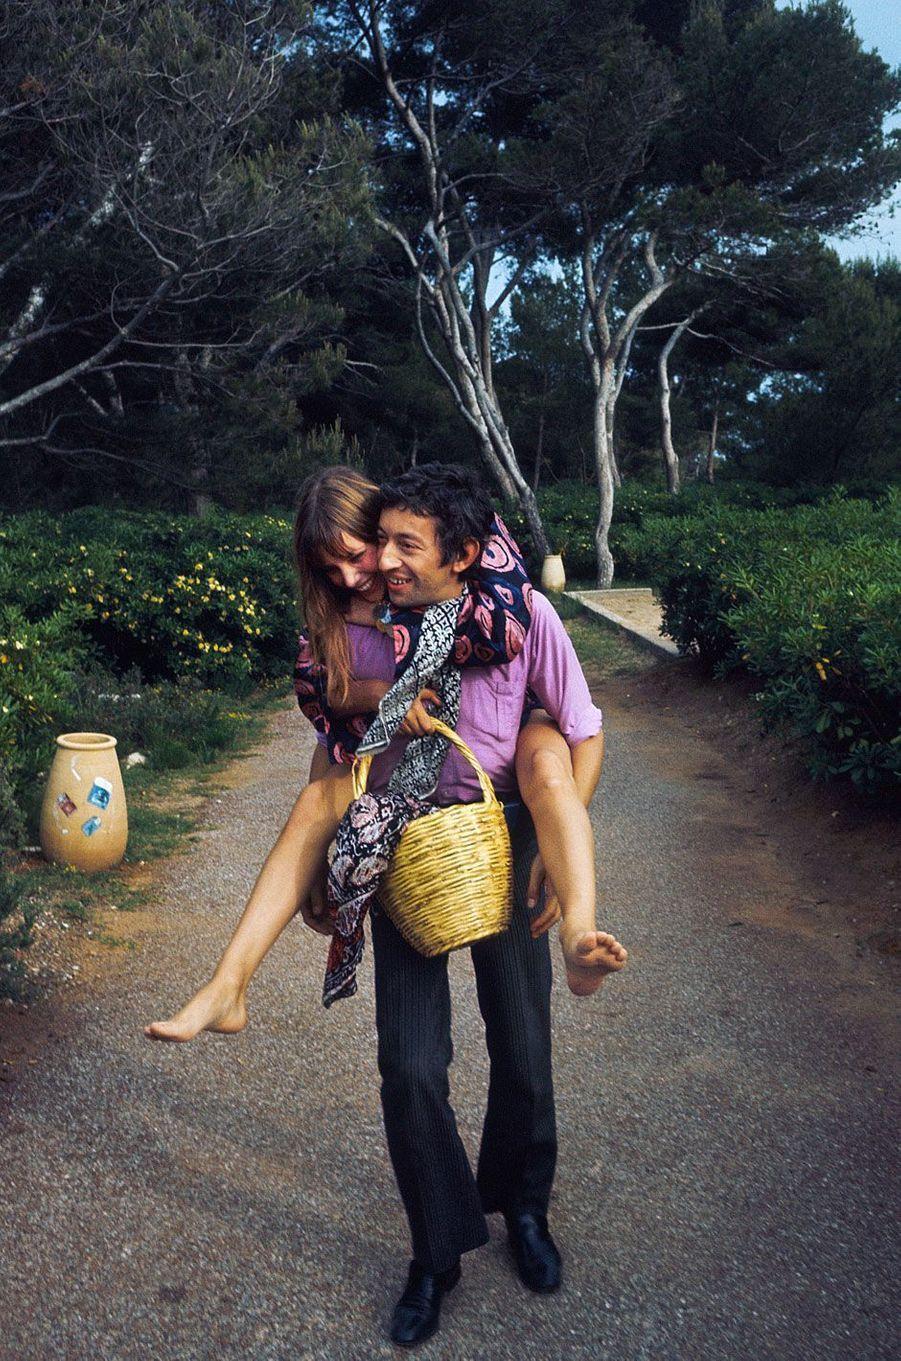 Serge Gainsbourg et Jane Birkin à Cannes.